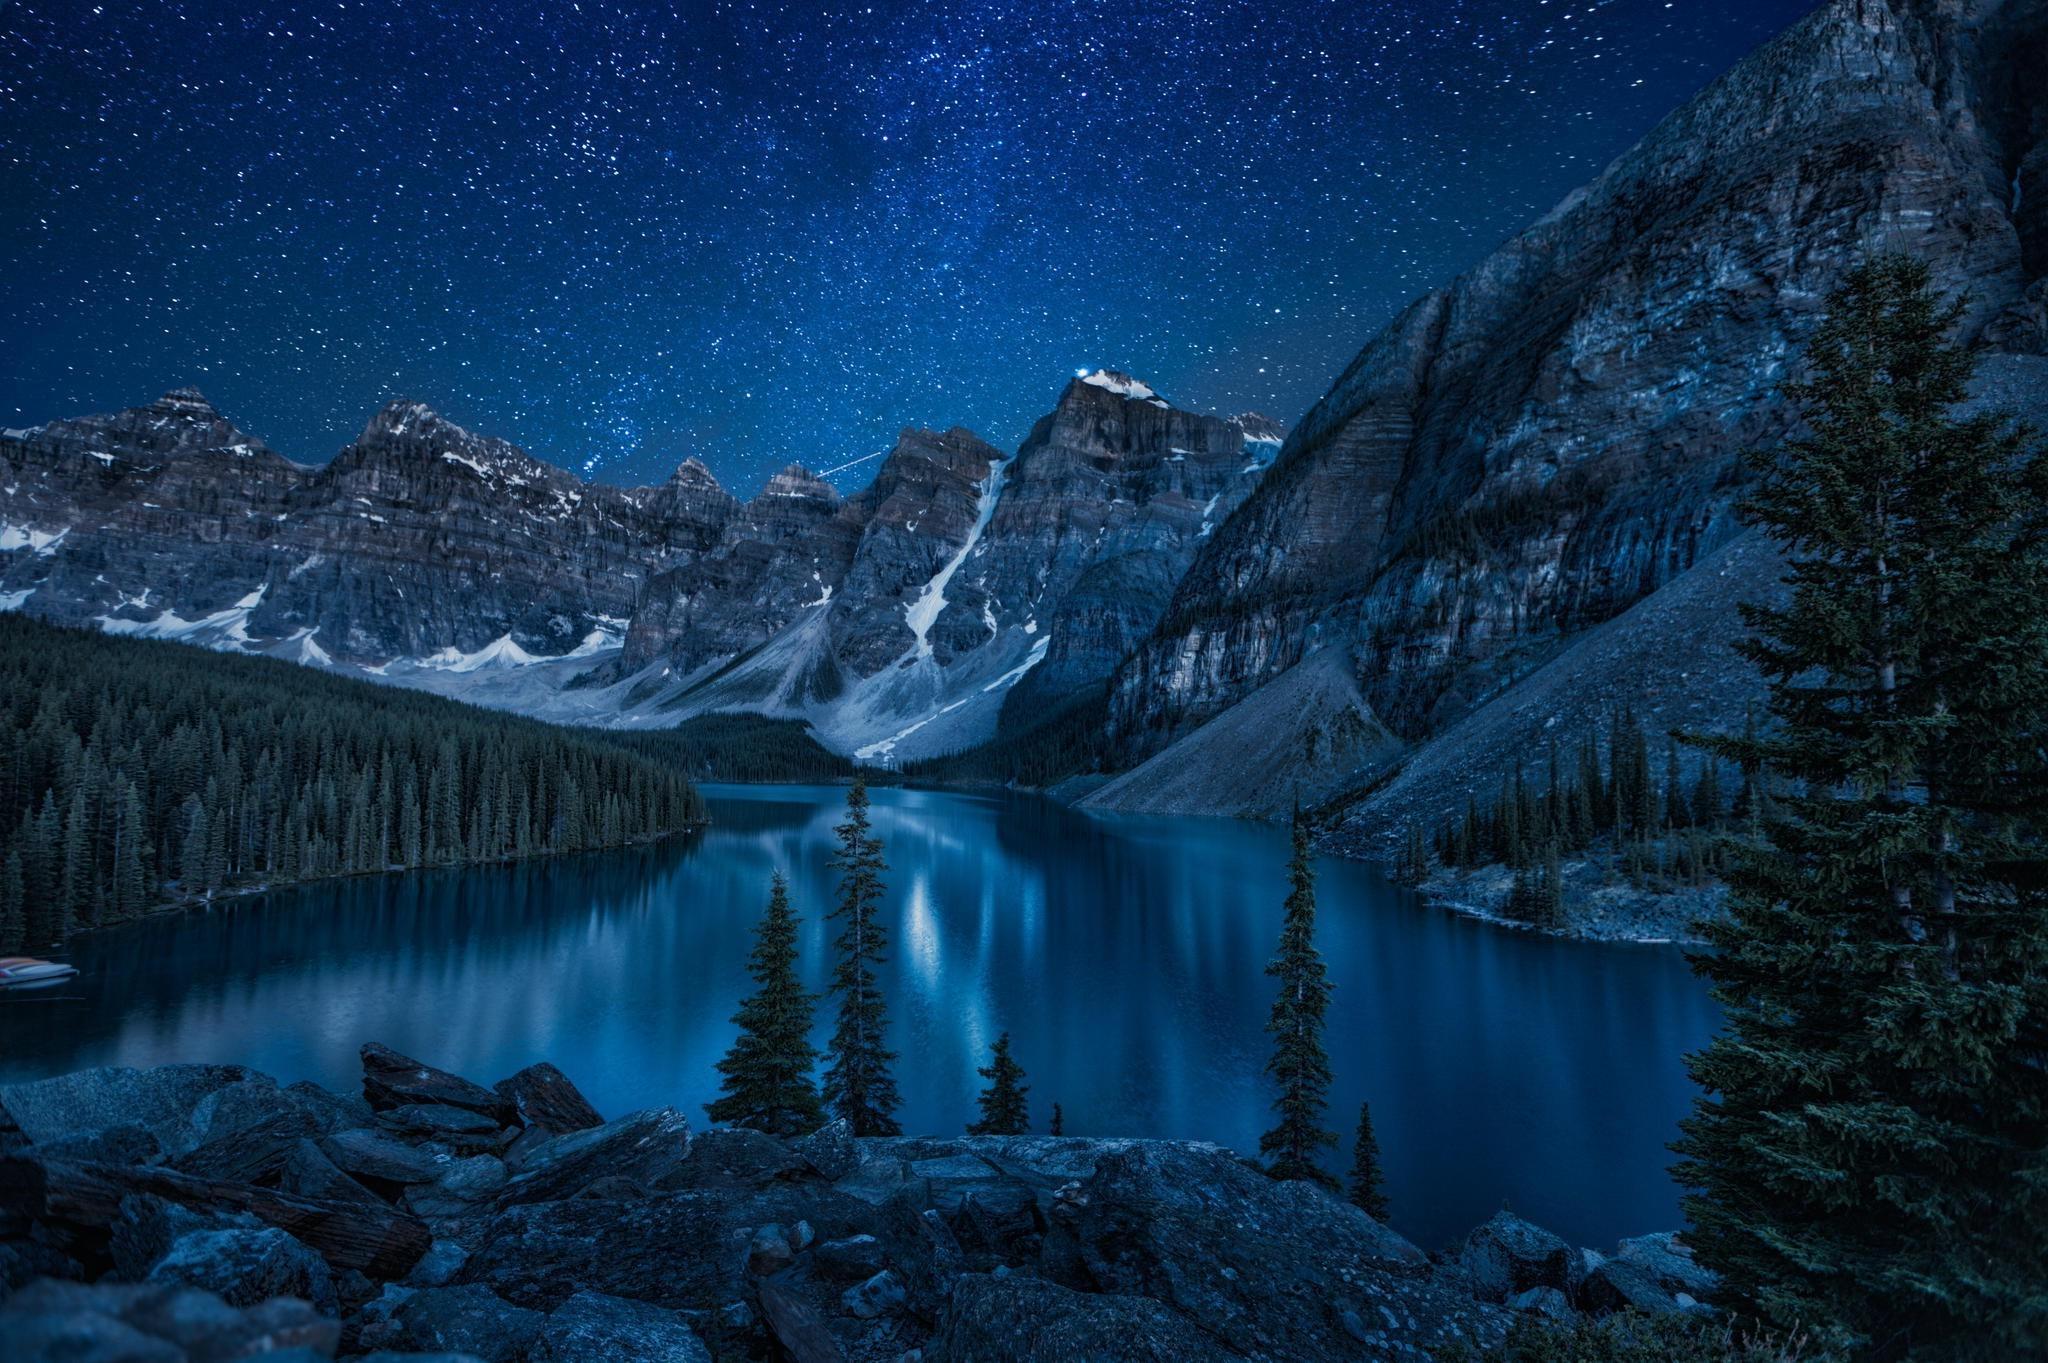 Snowy Desktop Backgrounds (47+ pictures)